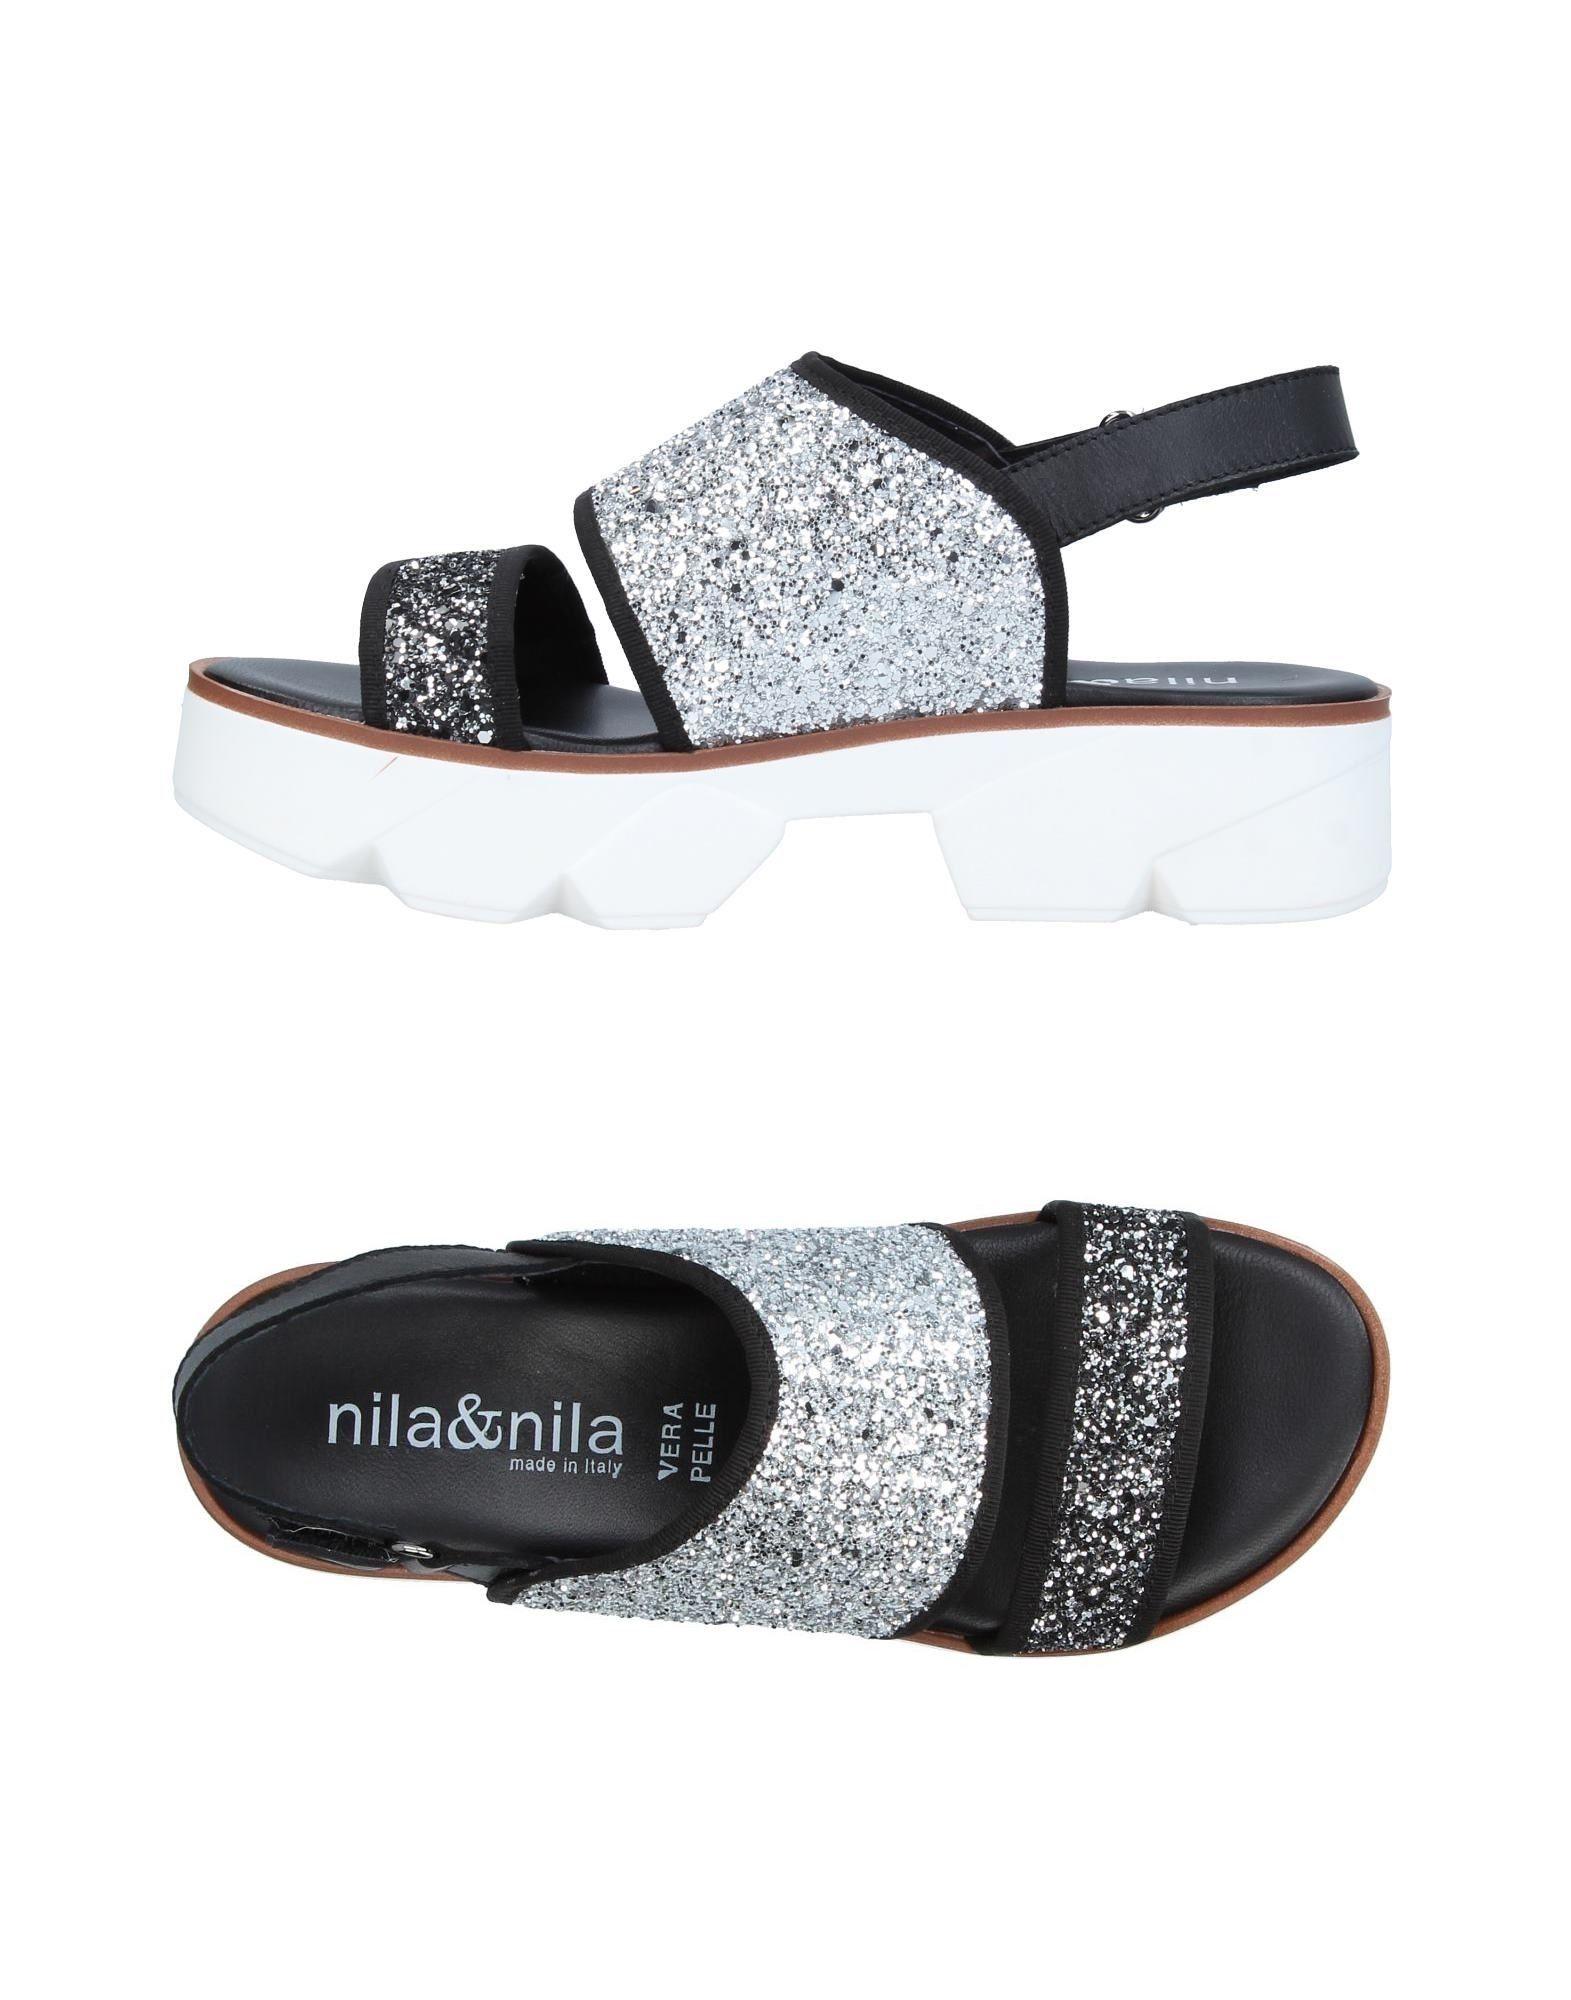 ФОТО nila & nila сандалии